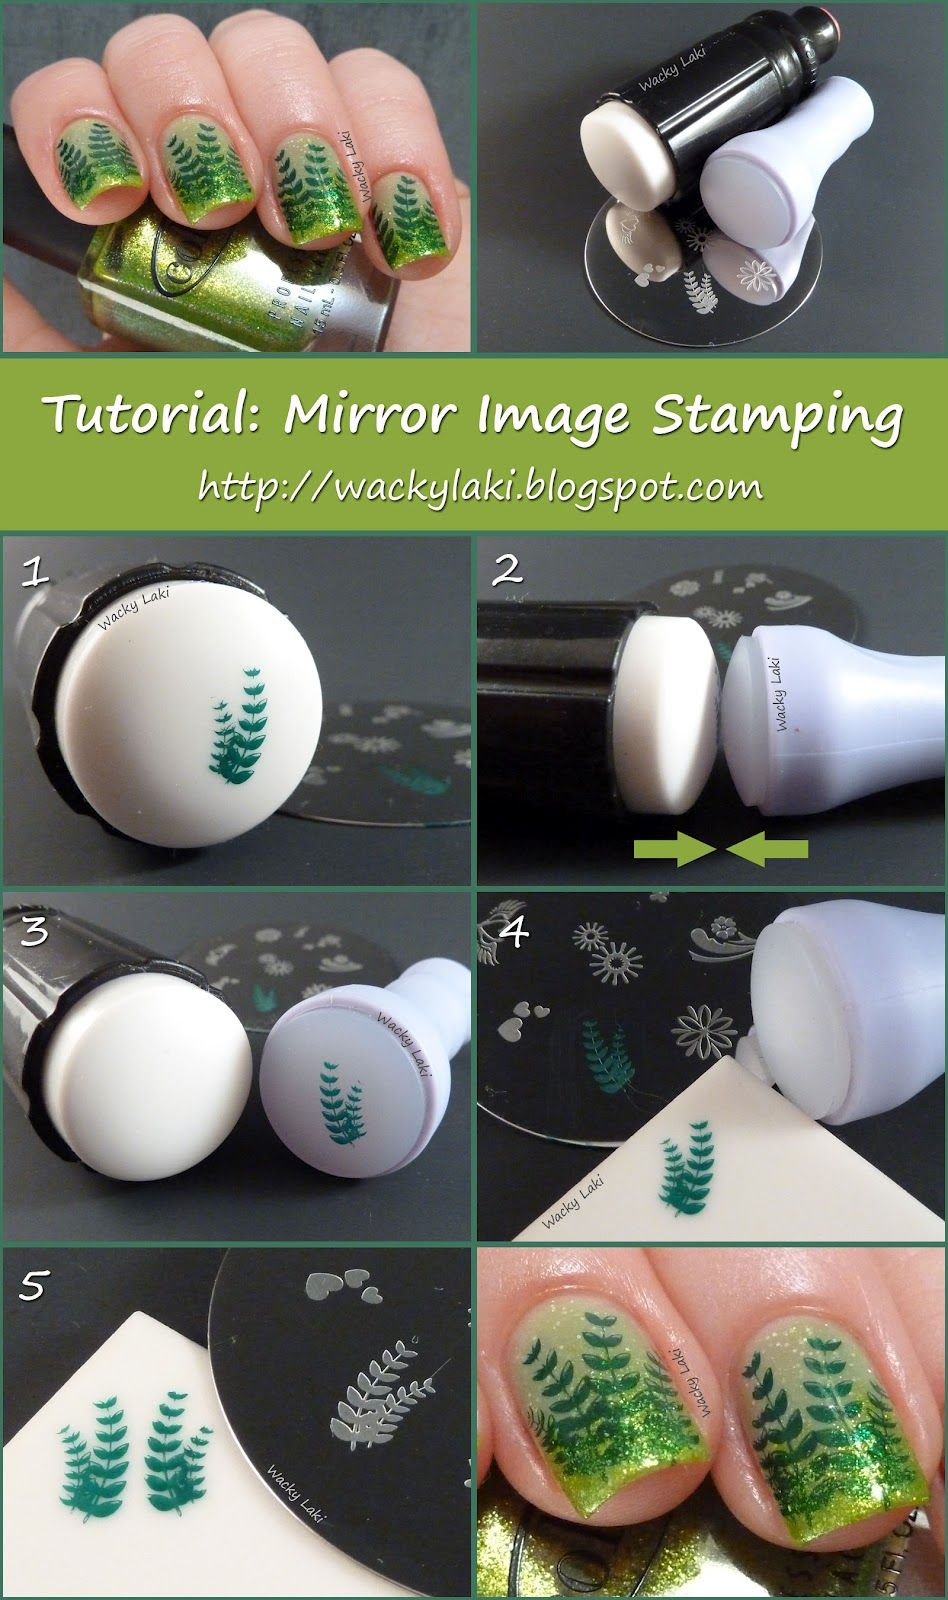 Wacky Laki - Tutorial: Mirror Image Stamping | Nail Art I Love ...